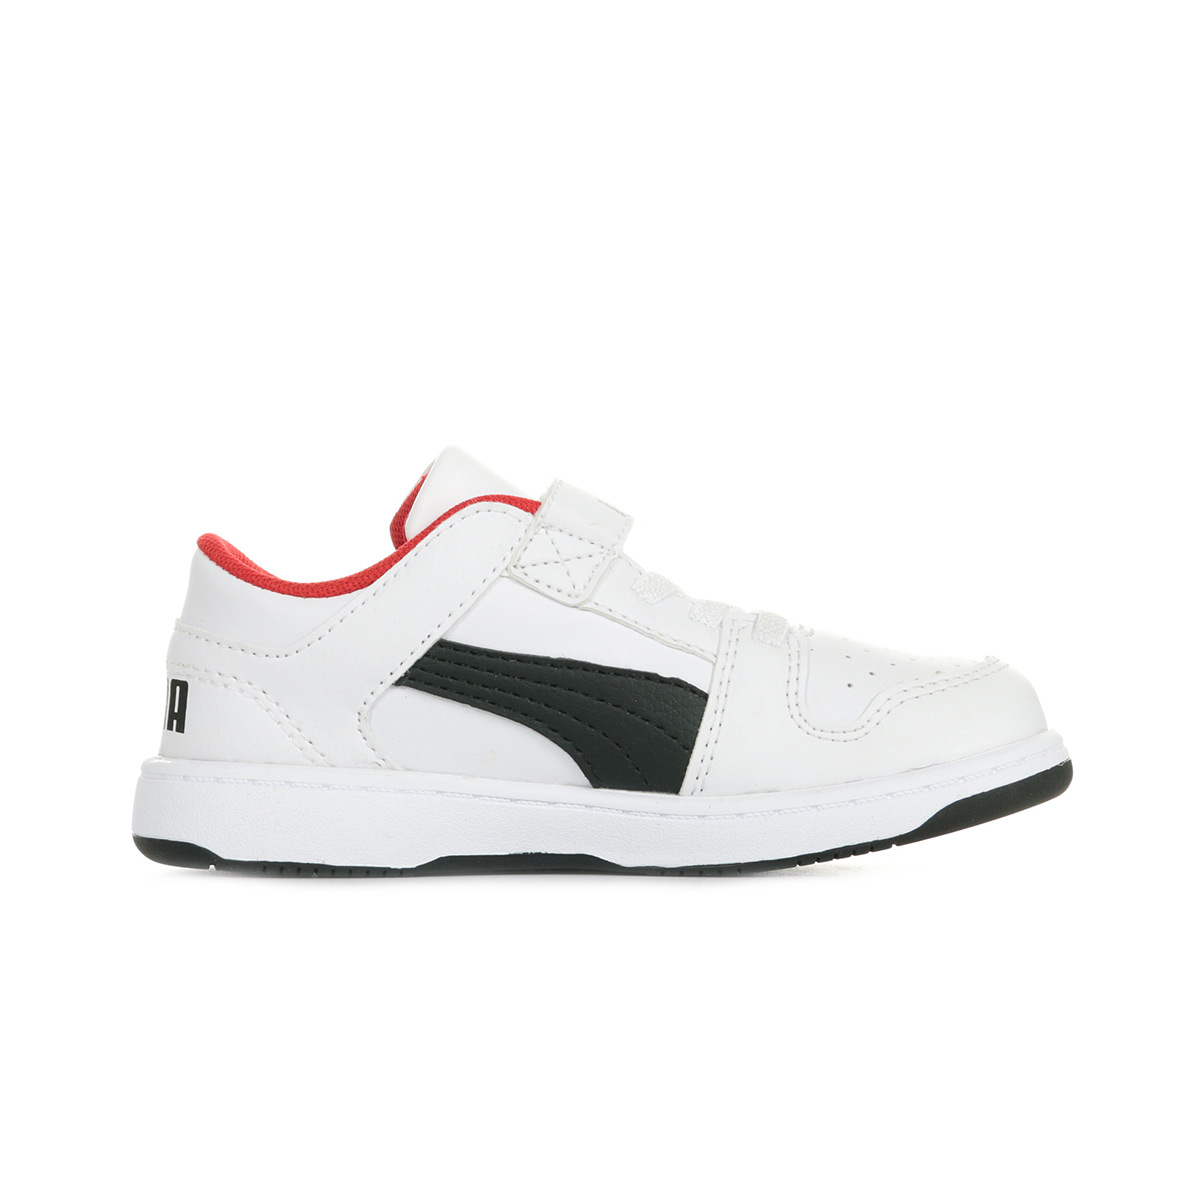 Blanc Noir Rouge PUMA Unisex-Kinder Rebound Layup Lo Sl Jr Sneaker